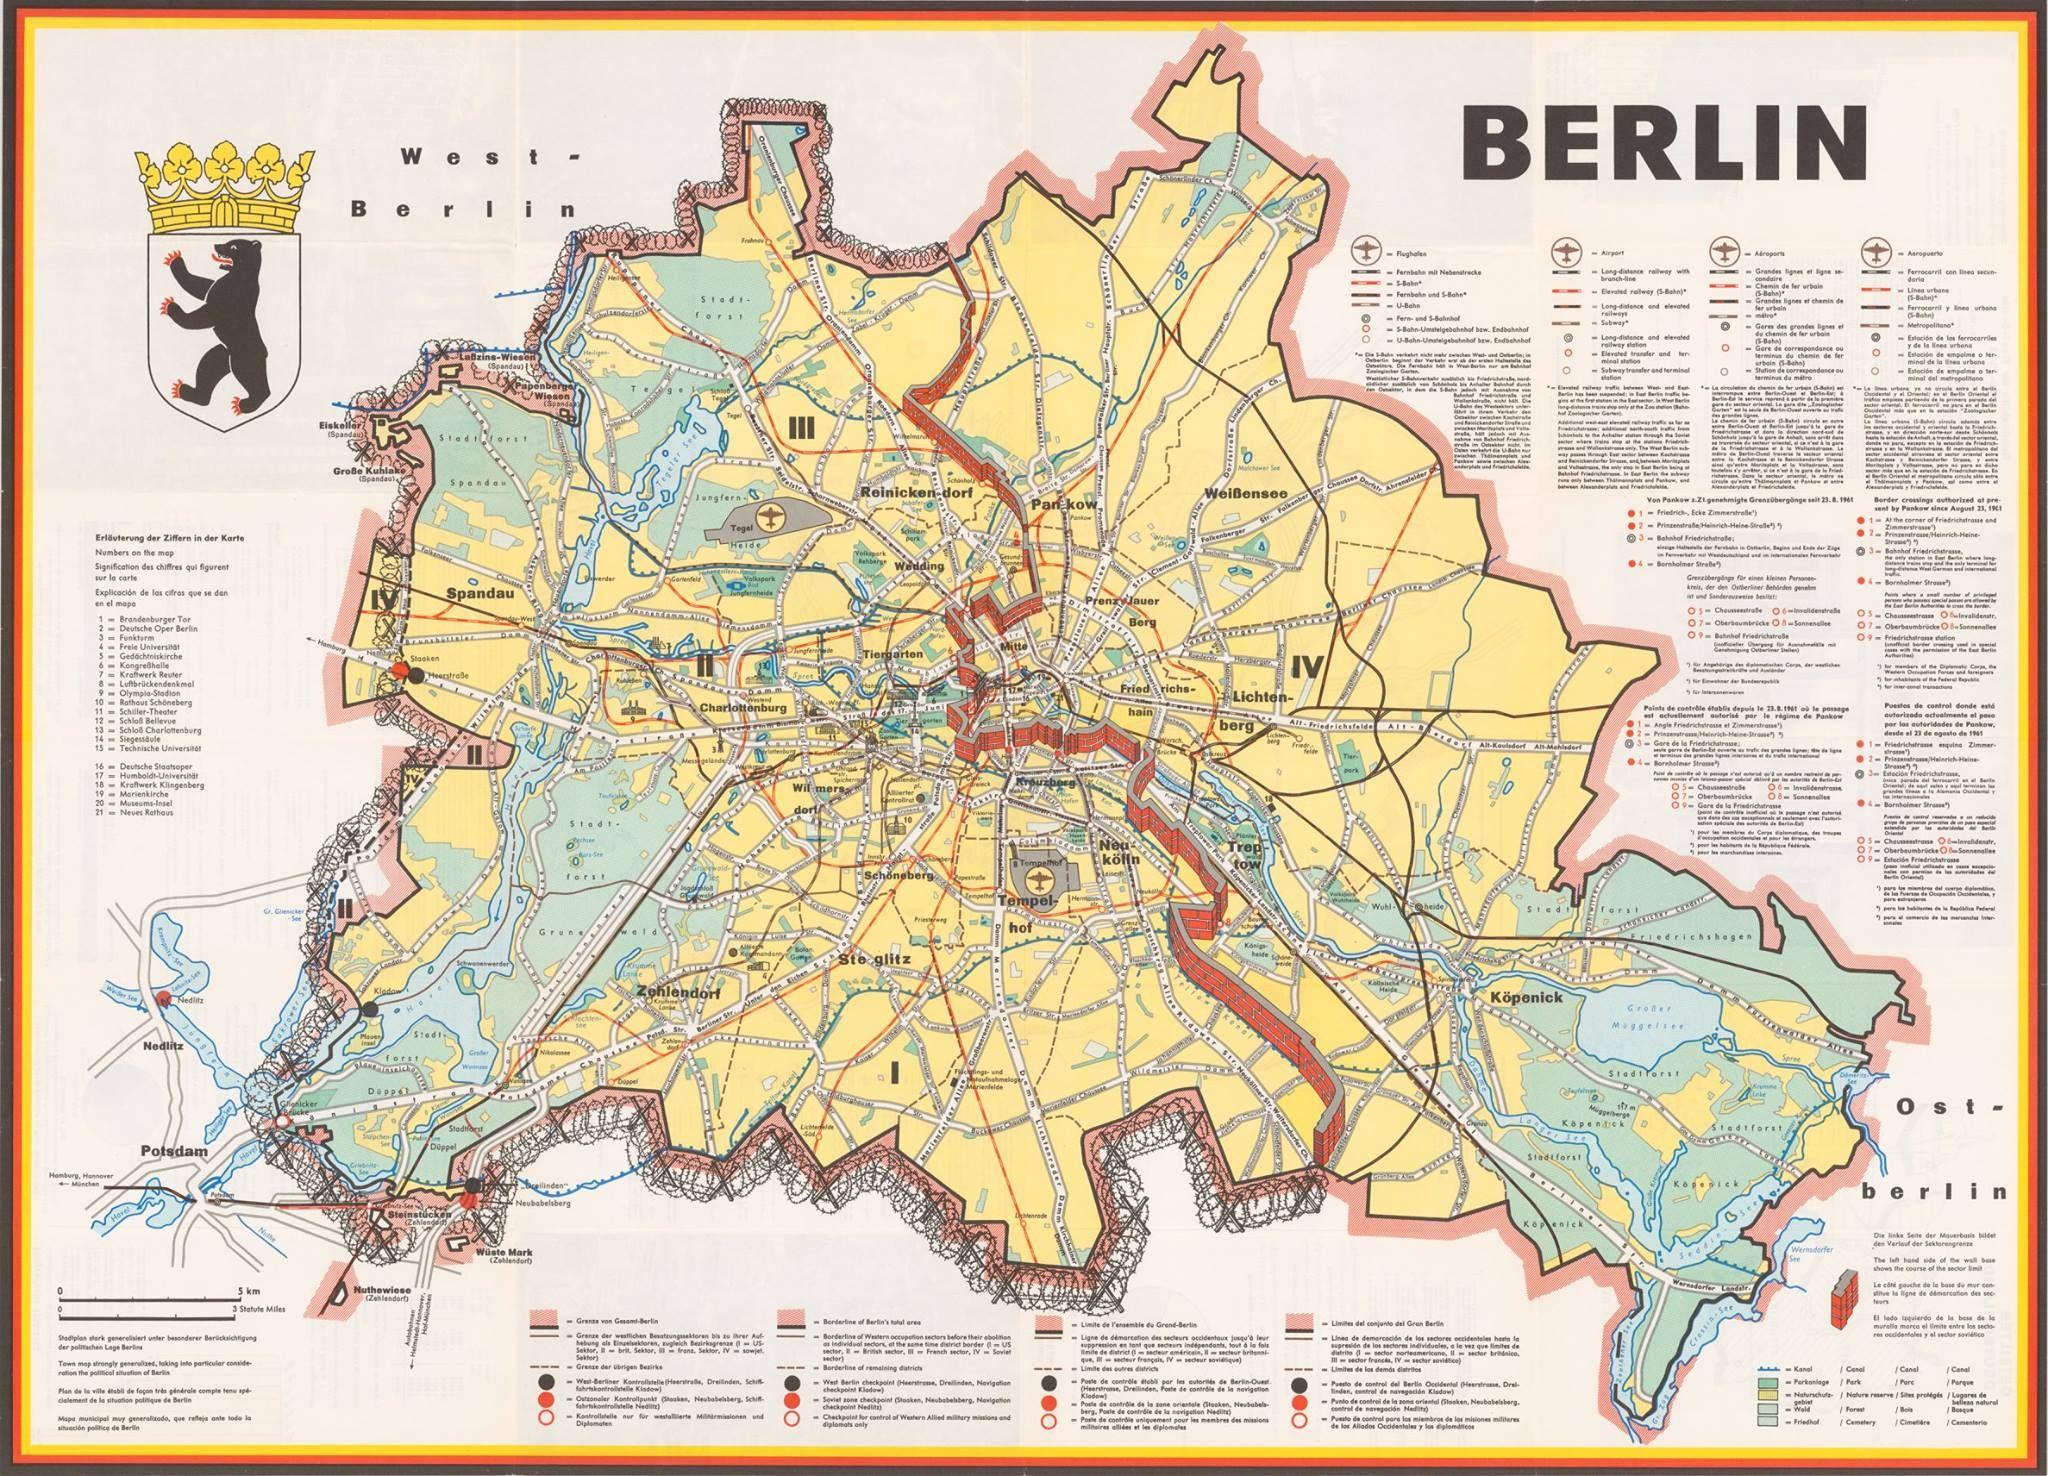 Berlin 1962 Kalter Krieg Propaganda Berlin Karte Berliner Mauer Karte